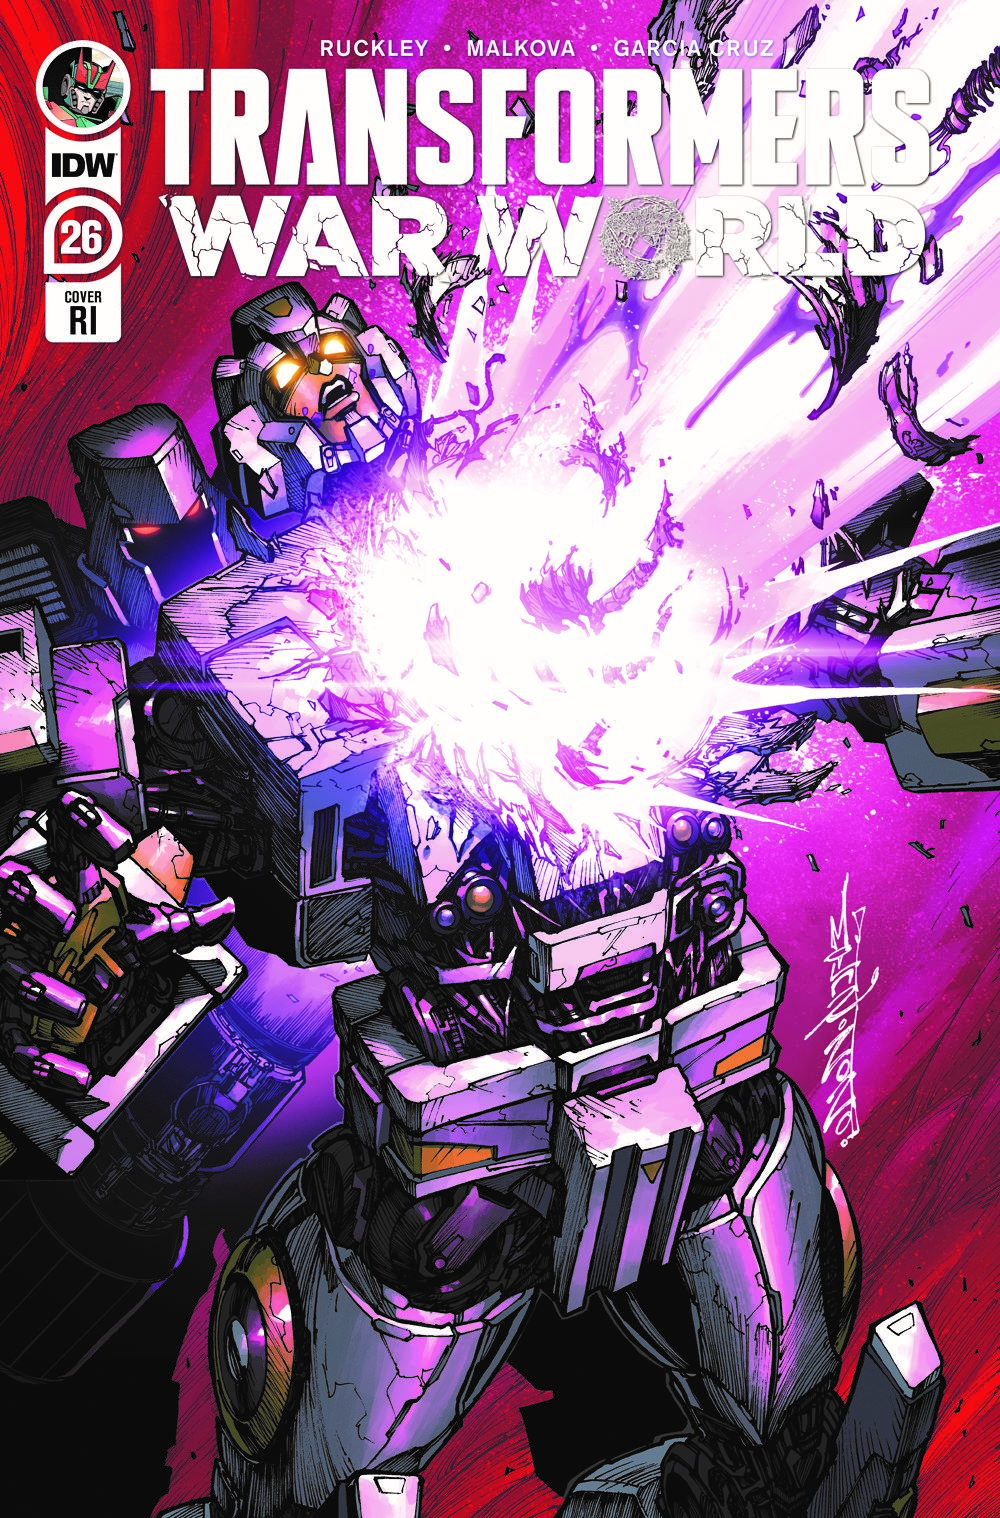 TF26-cvr-RI ComicList Previews: TRANSFORMERS #26